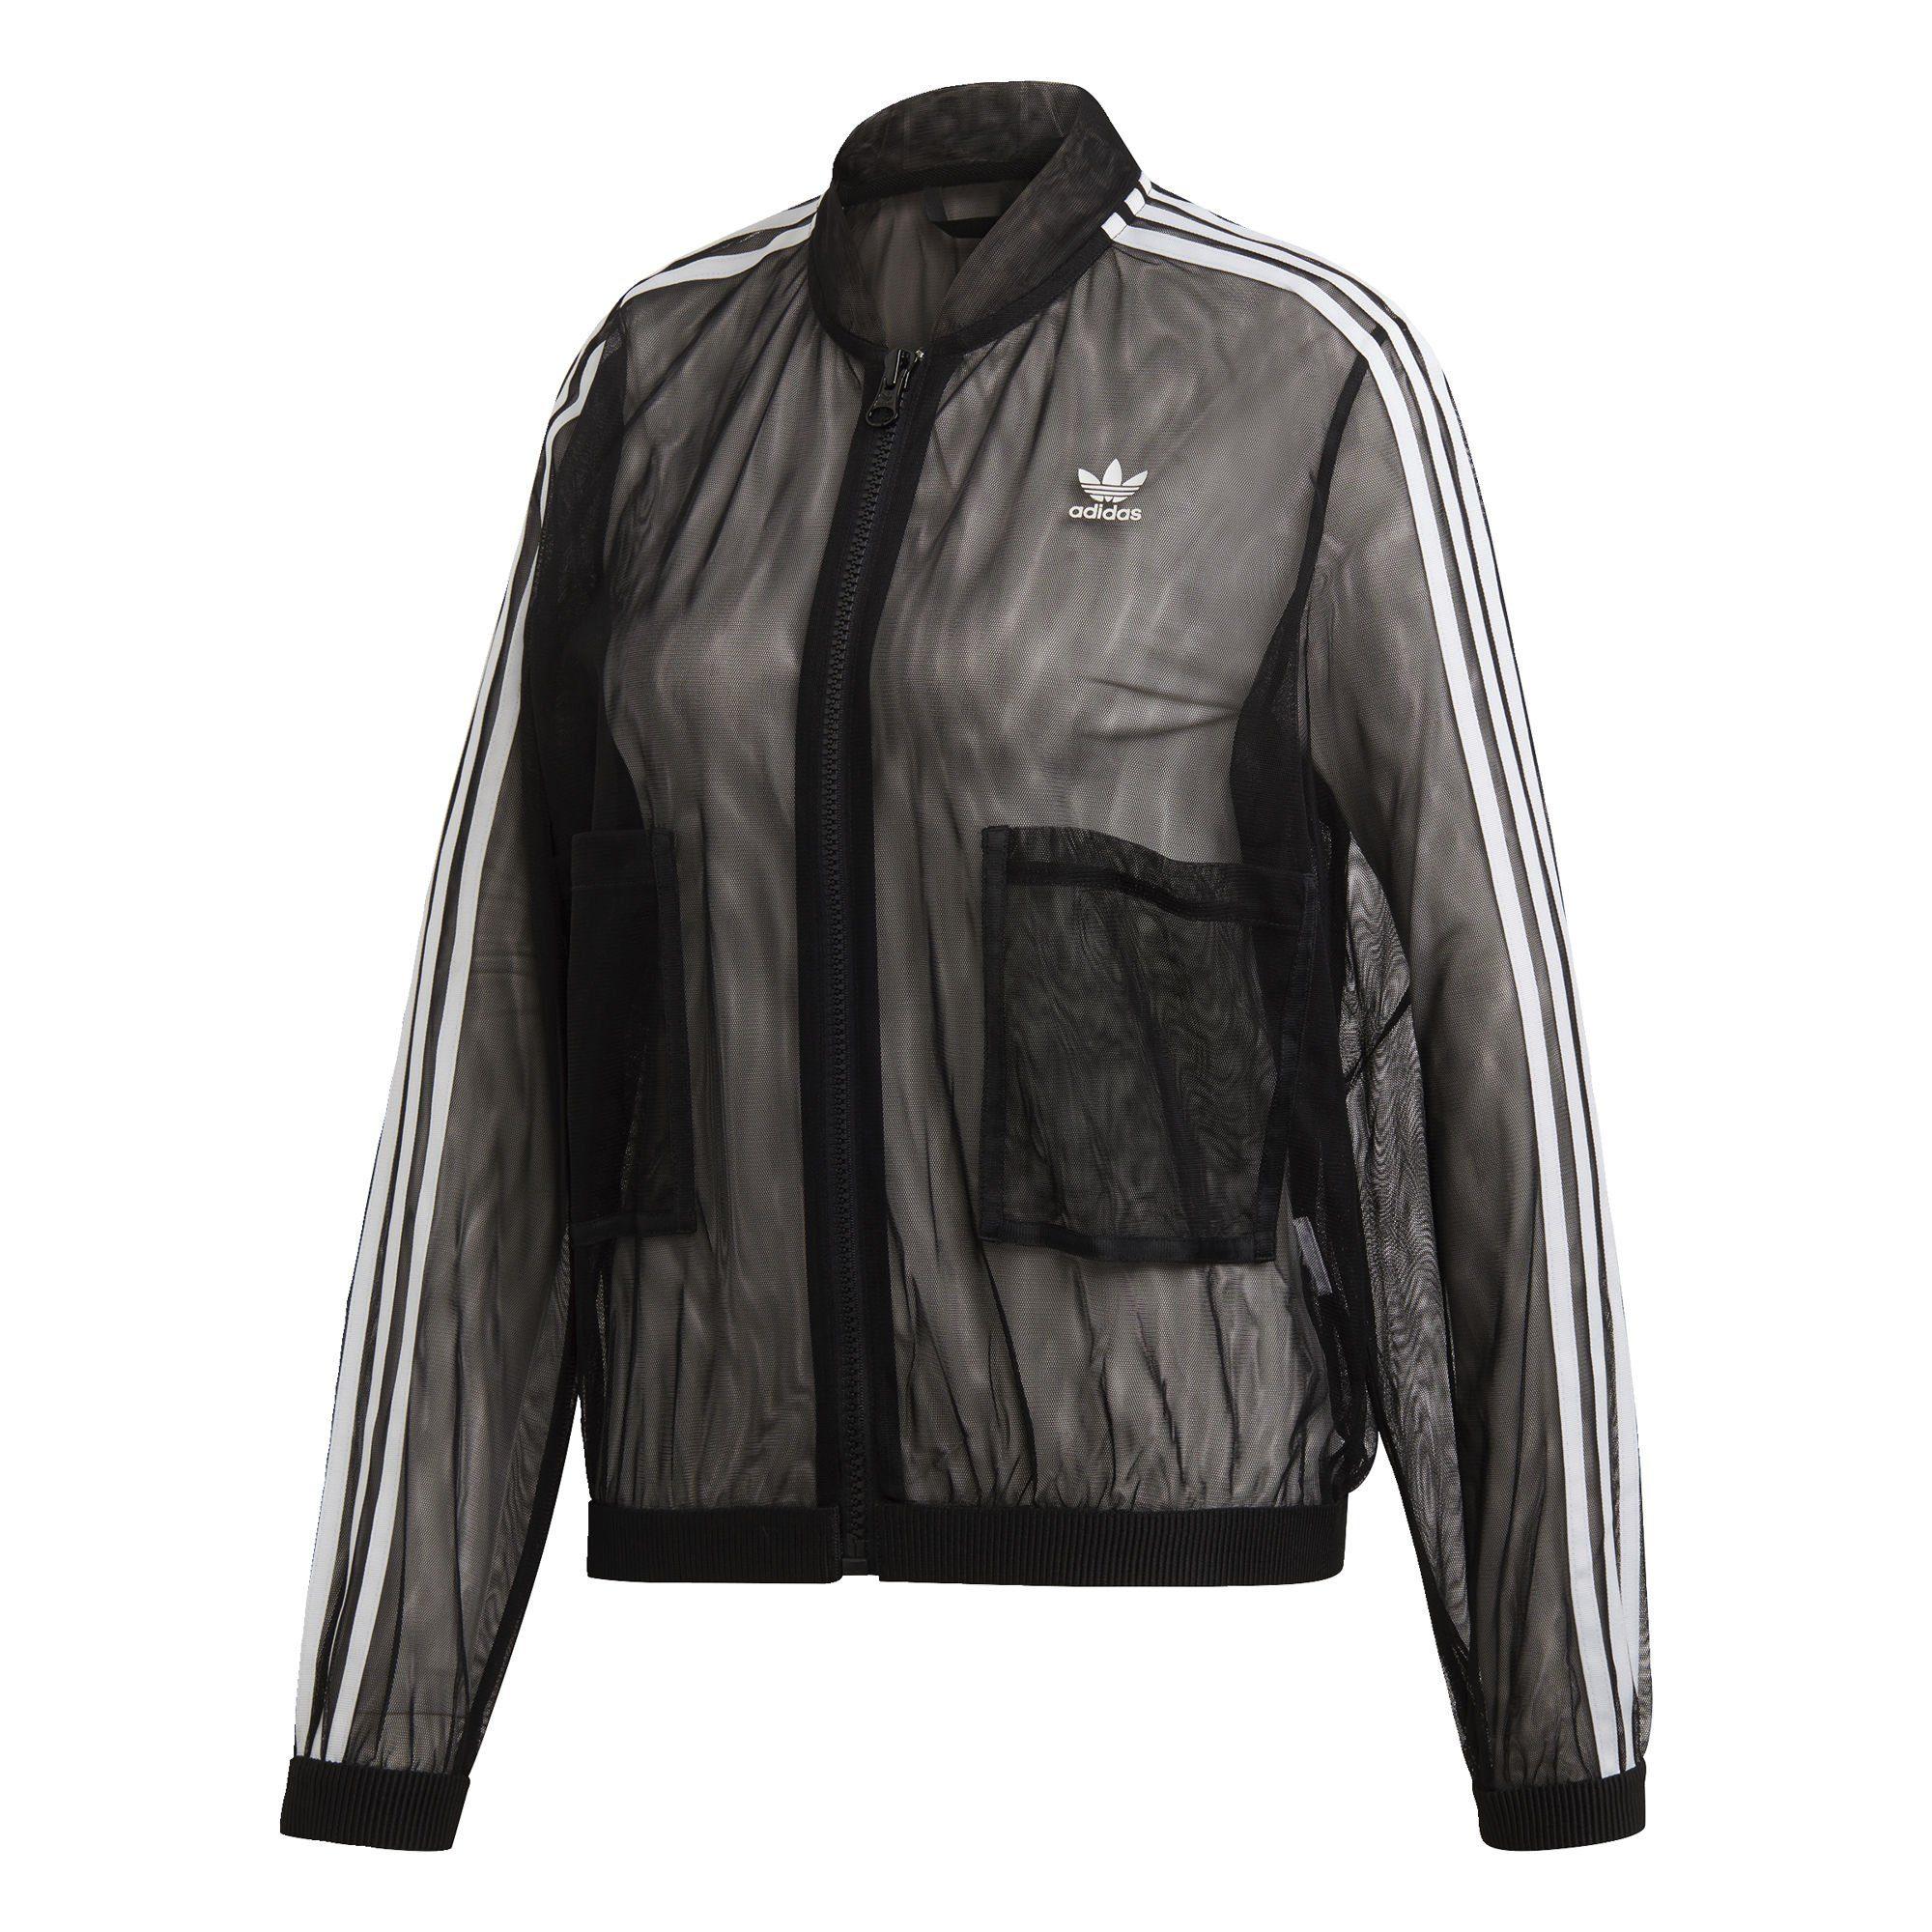 adidas Originals Sweatjacke »Originals Jacke« adicolor online kaufen | OTTO